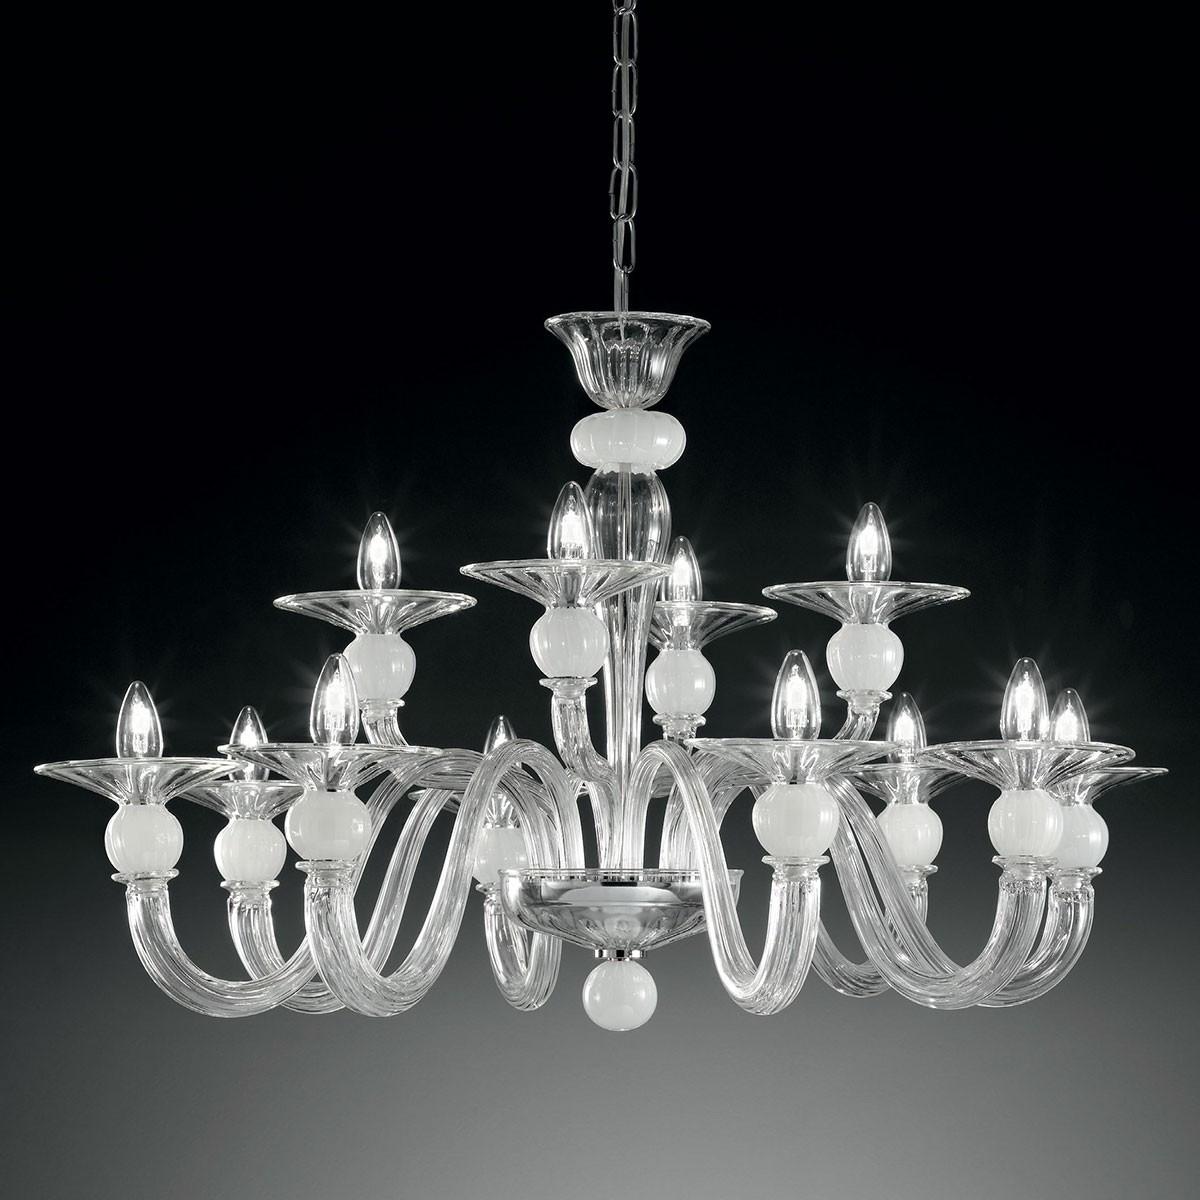 """Ermione"" lampara de araña de Murano dos niveles - 8+4 luces - transparente y blanco"